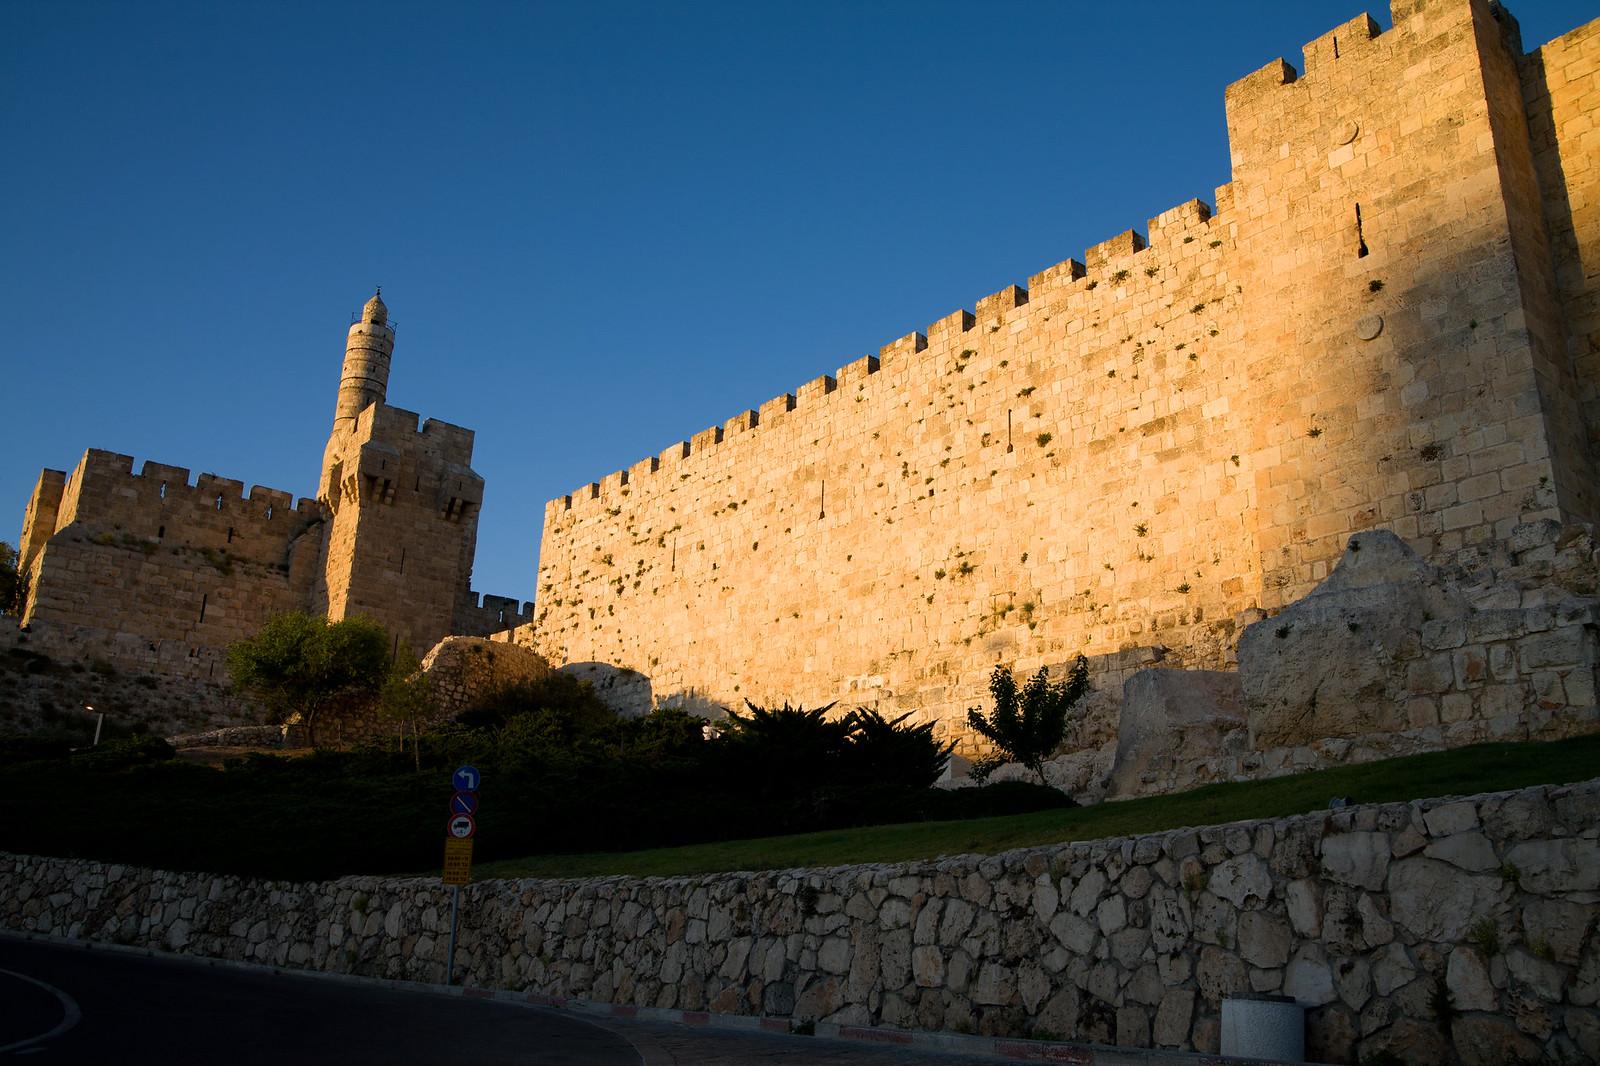 Jerusalem_The Tower of David_7_Noam Chen_IMOT